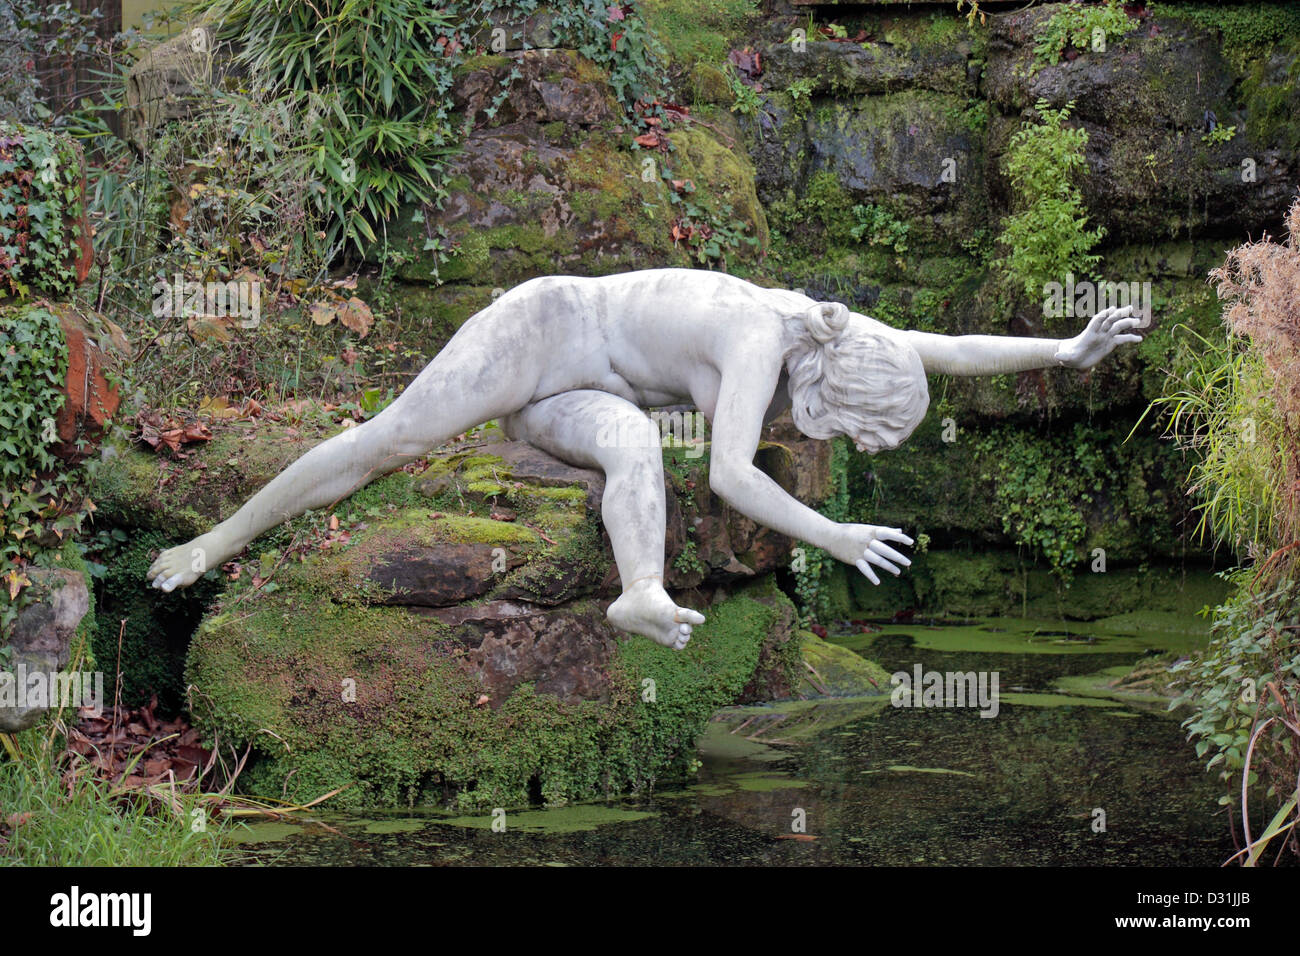 ... One Of The York House Garden Statues In Twickenham, London, UK.   Stock